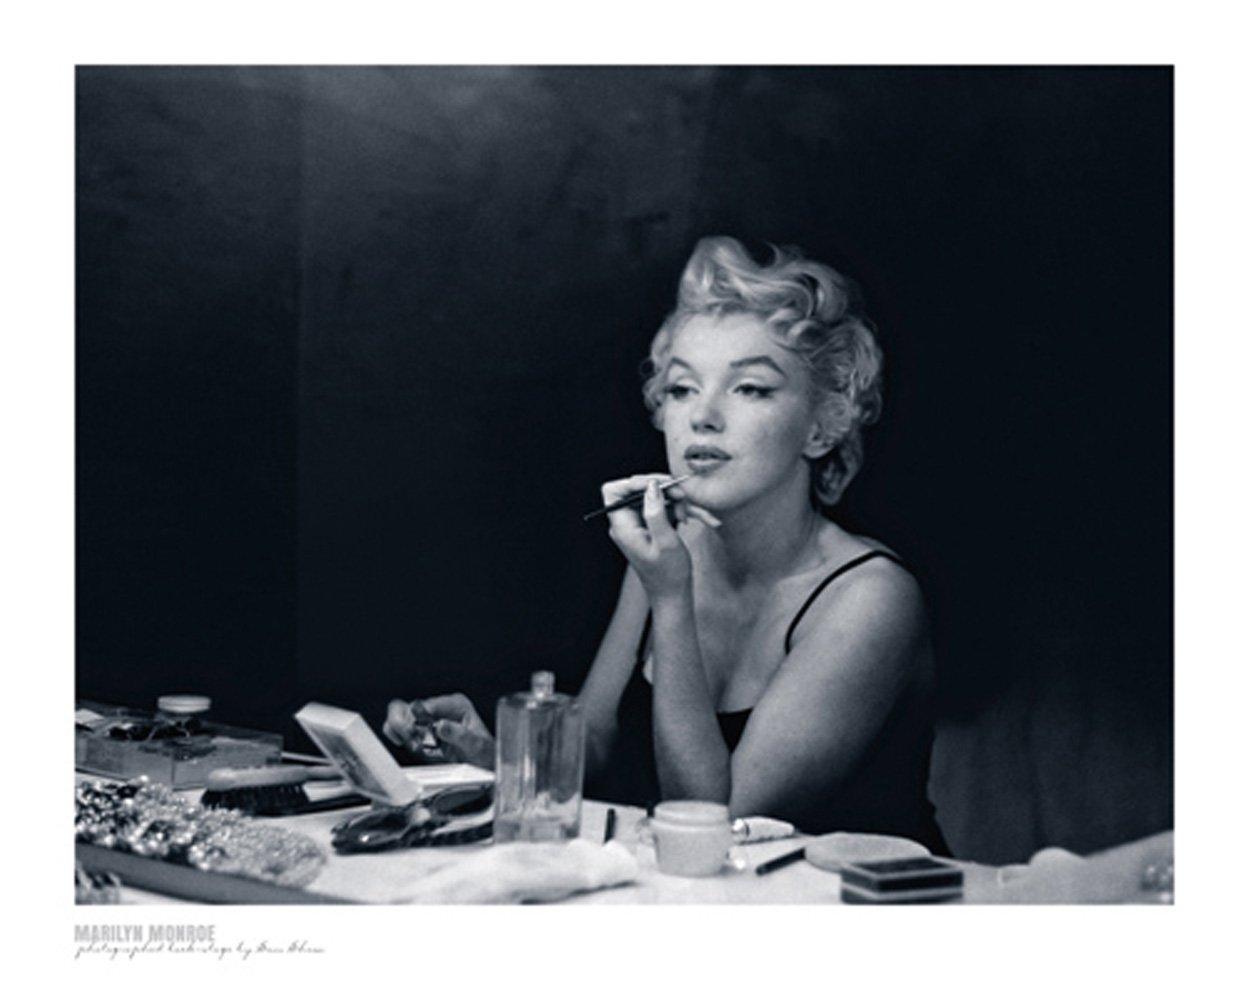 Editions Braun W04167 Shaw Marilyn Monroe Backstage Affiche Papier Noir 40x50 cm